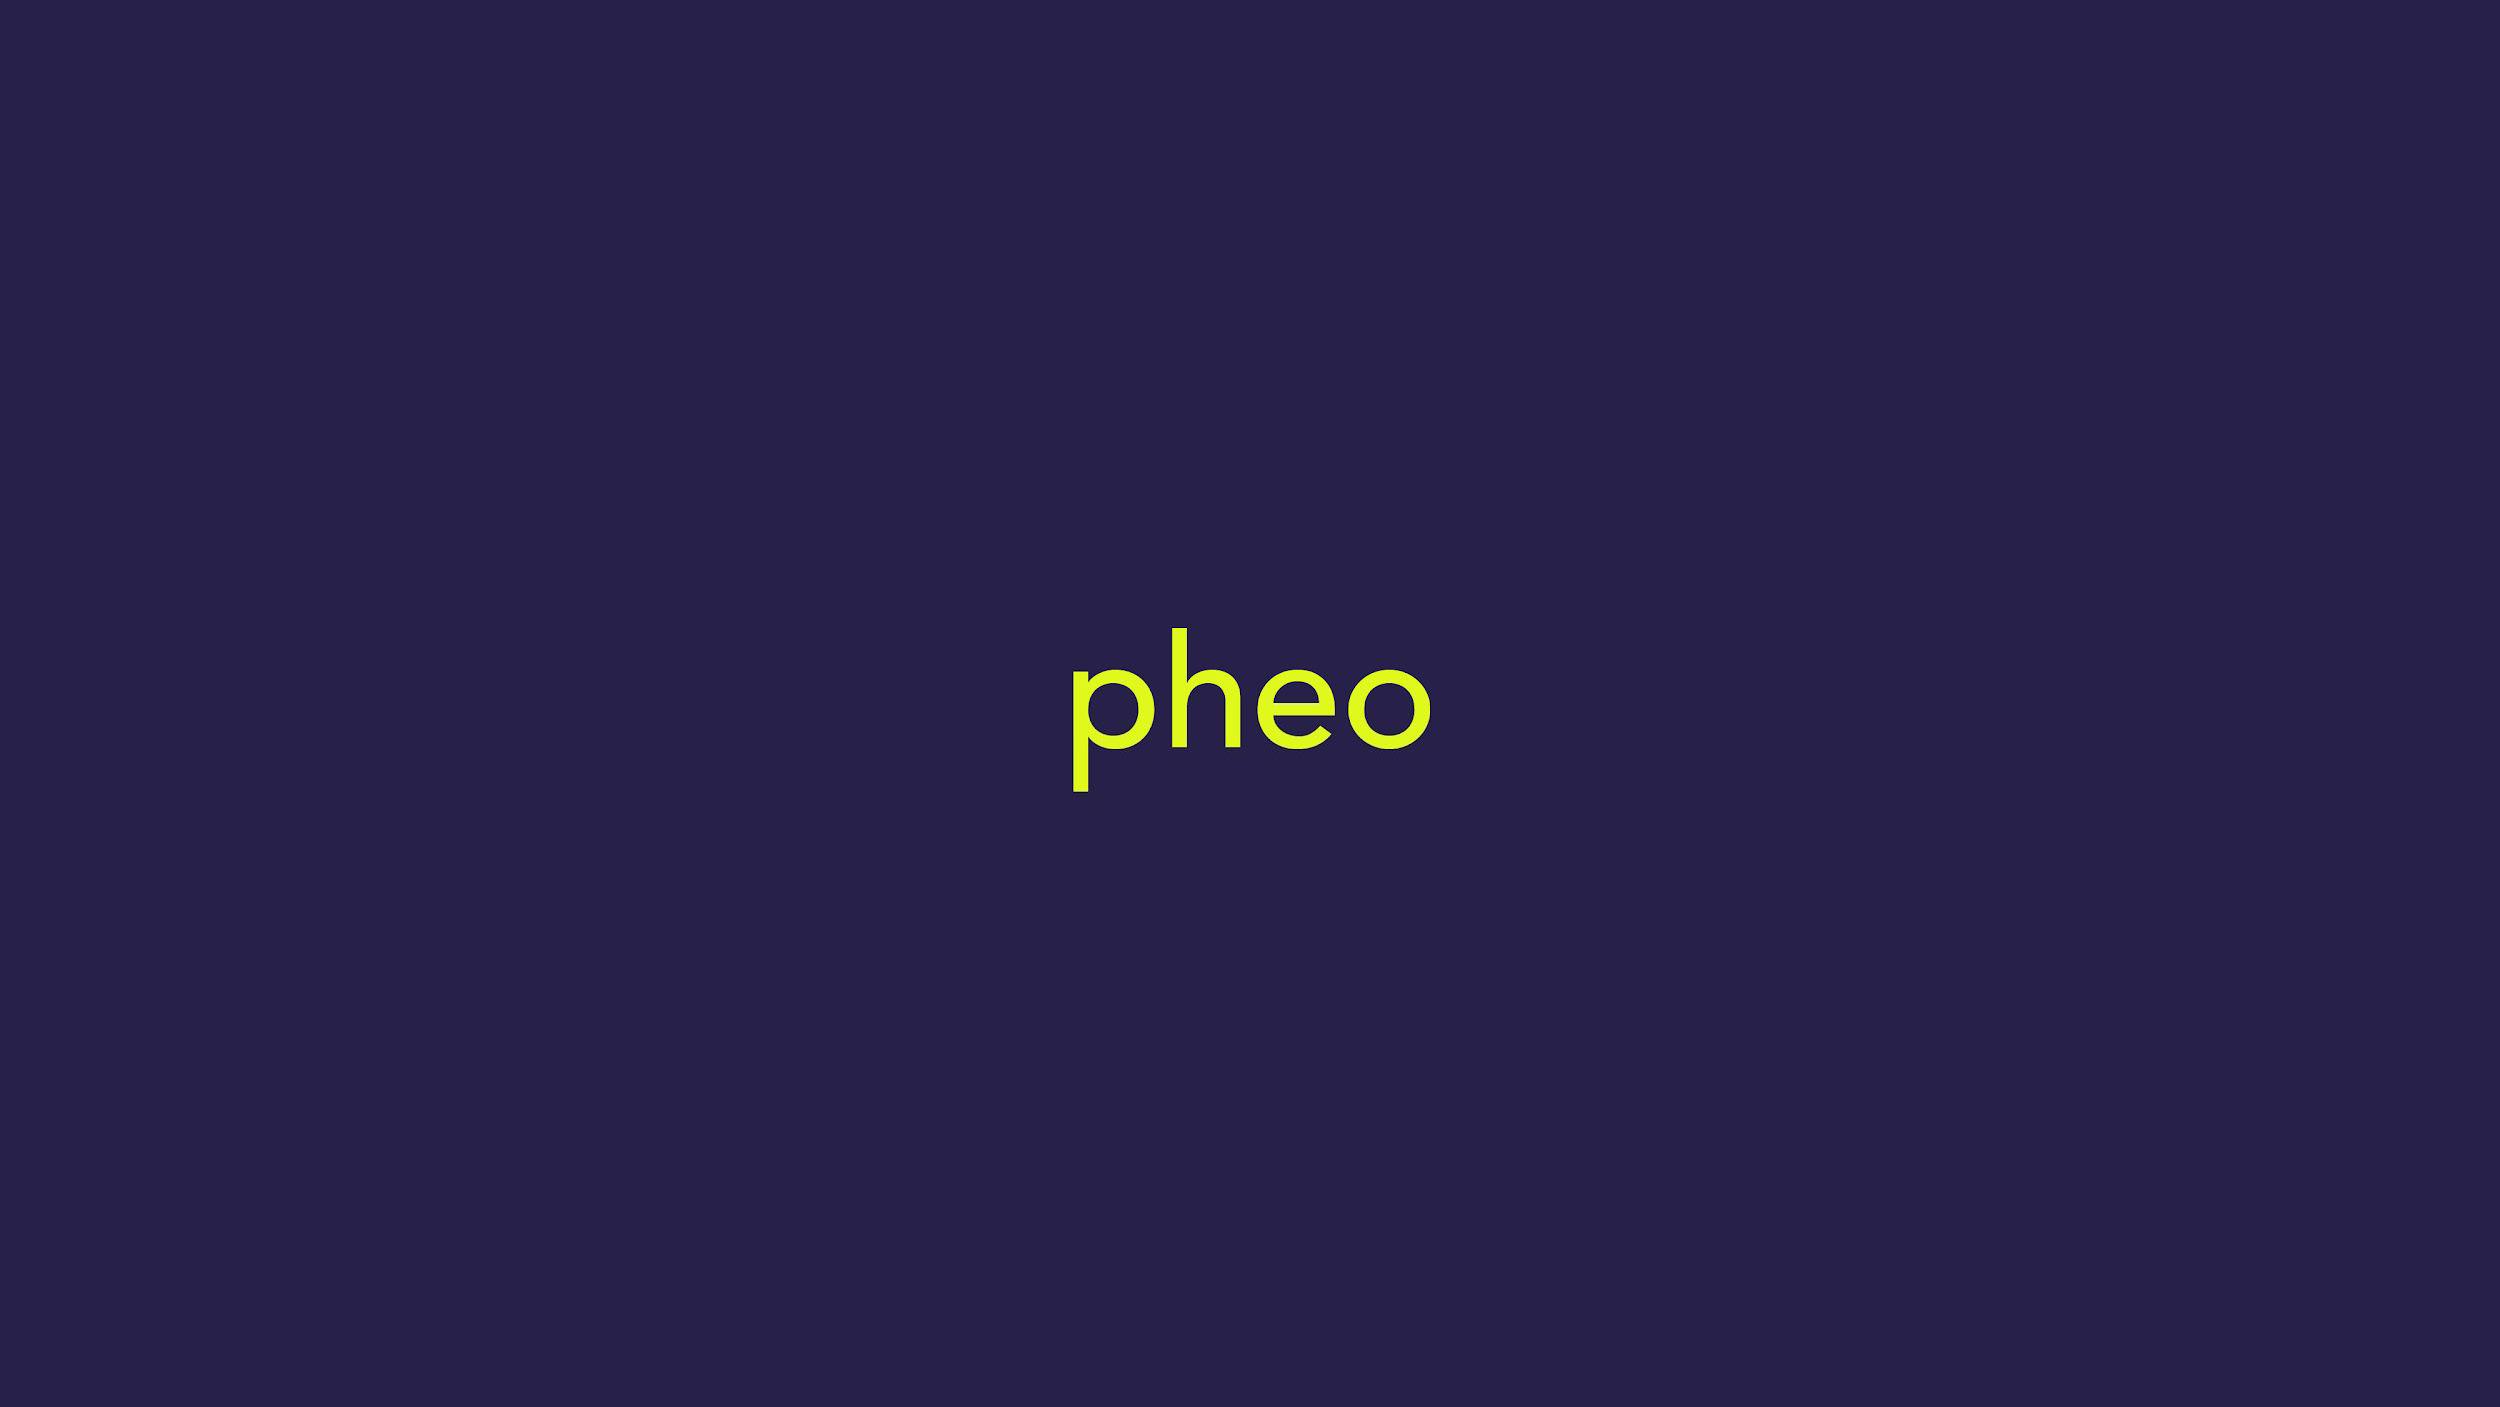 Pheo_process_Page_41.jpg